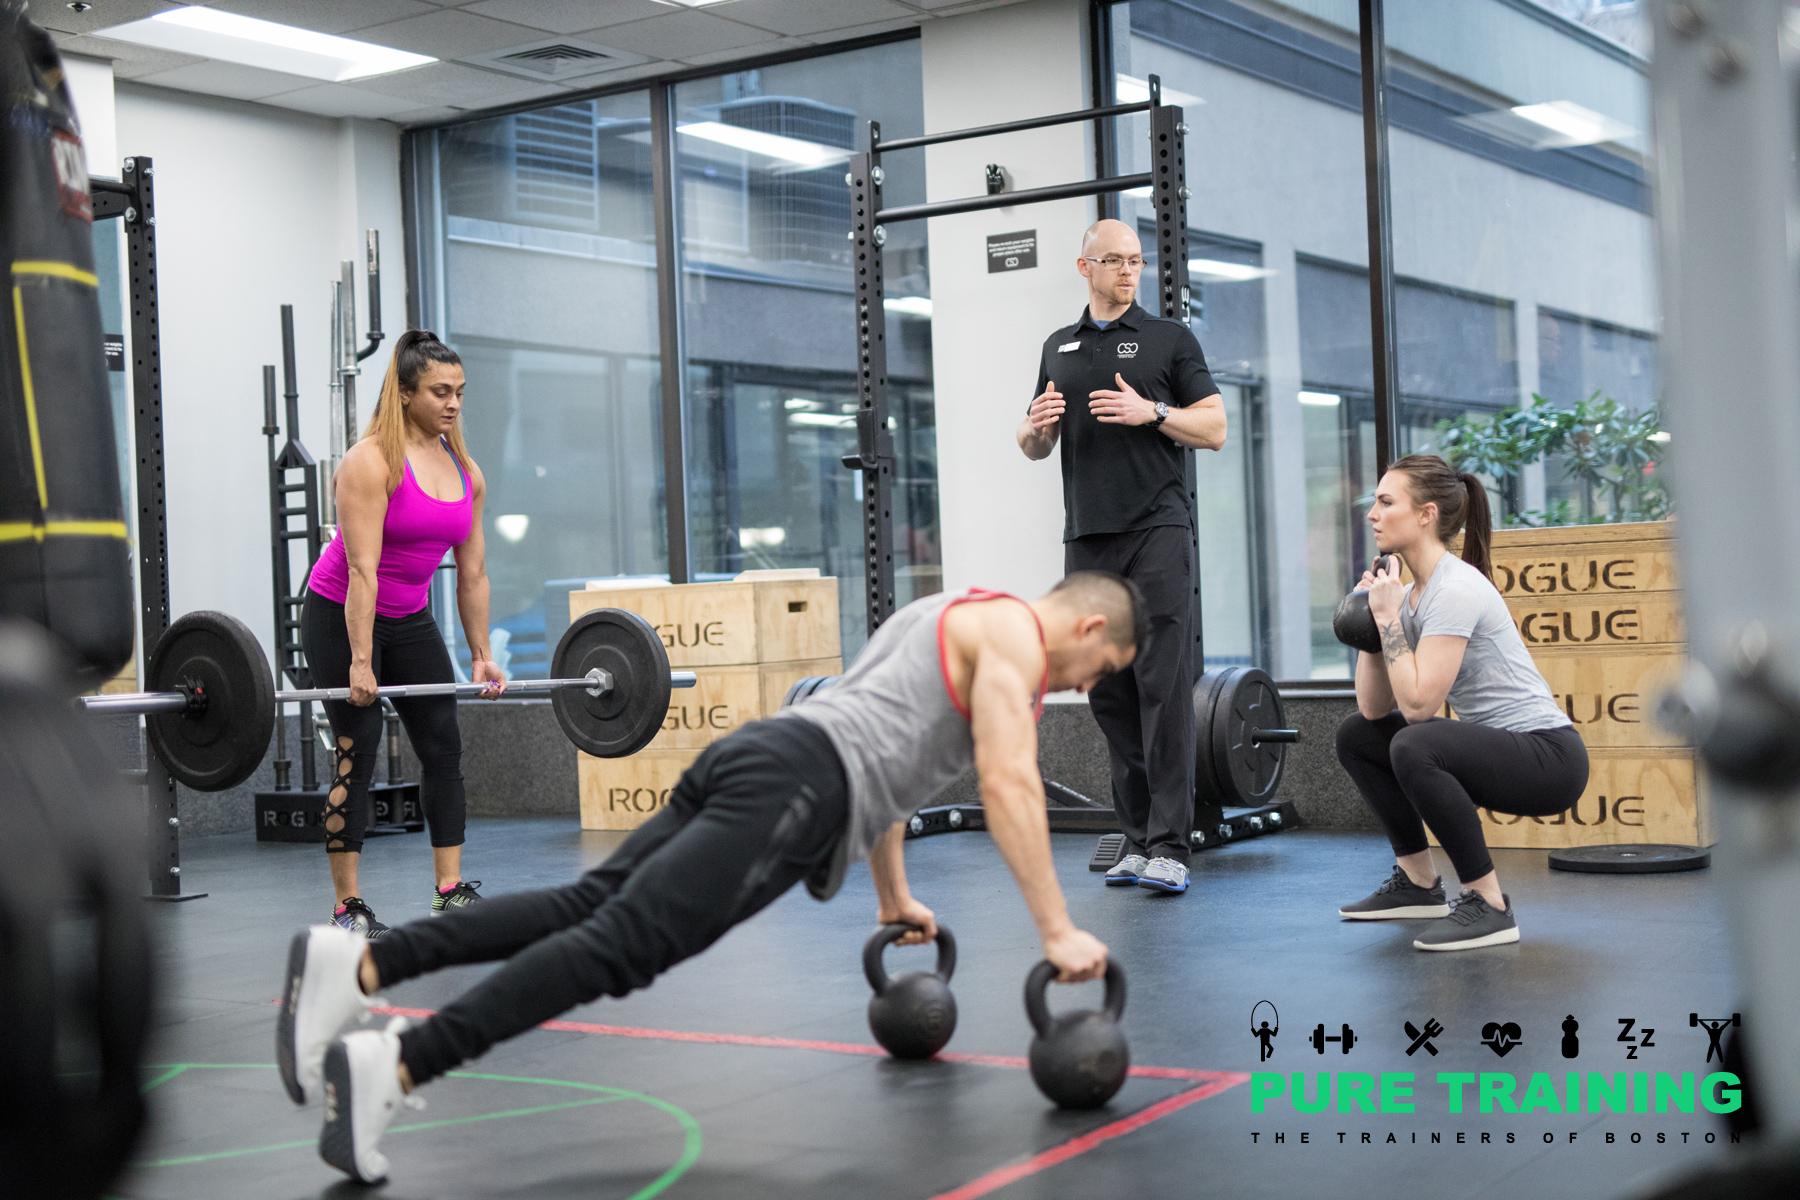 Pure Training Commonwealth Sports Club